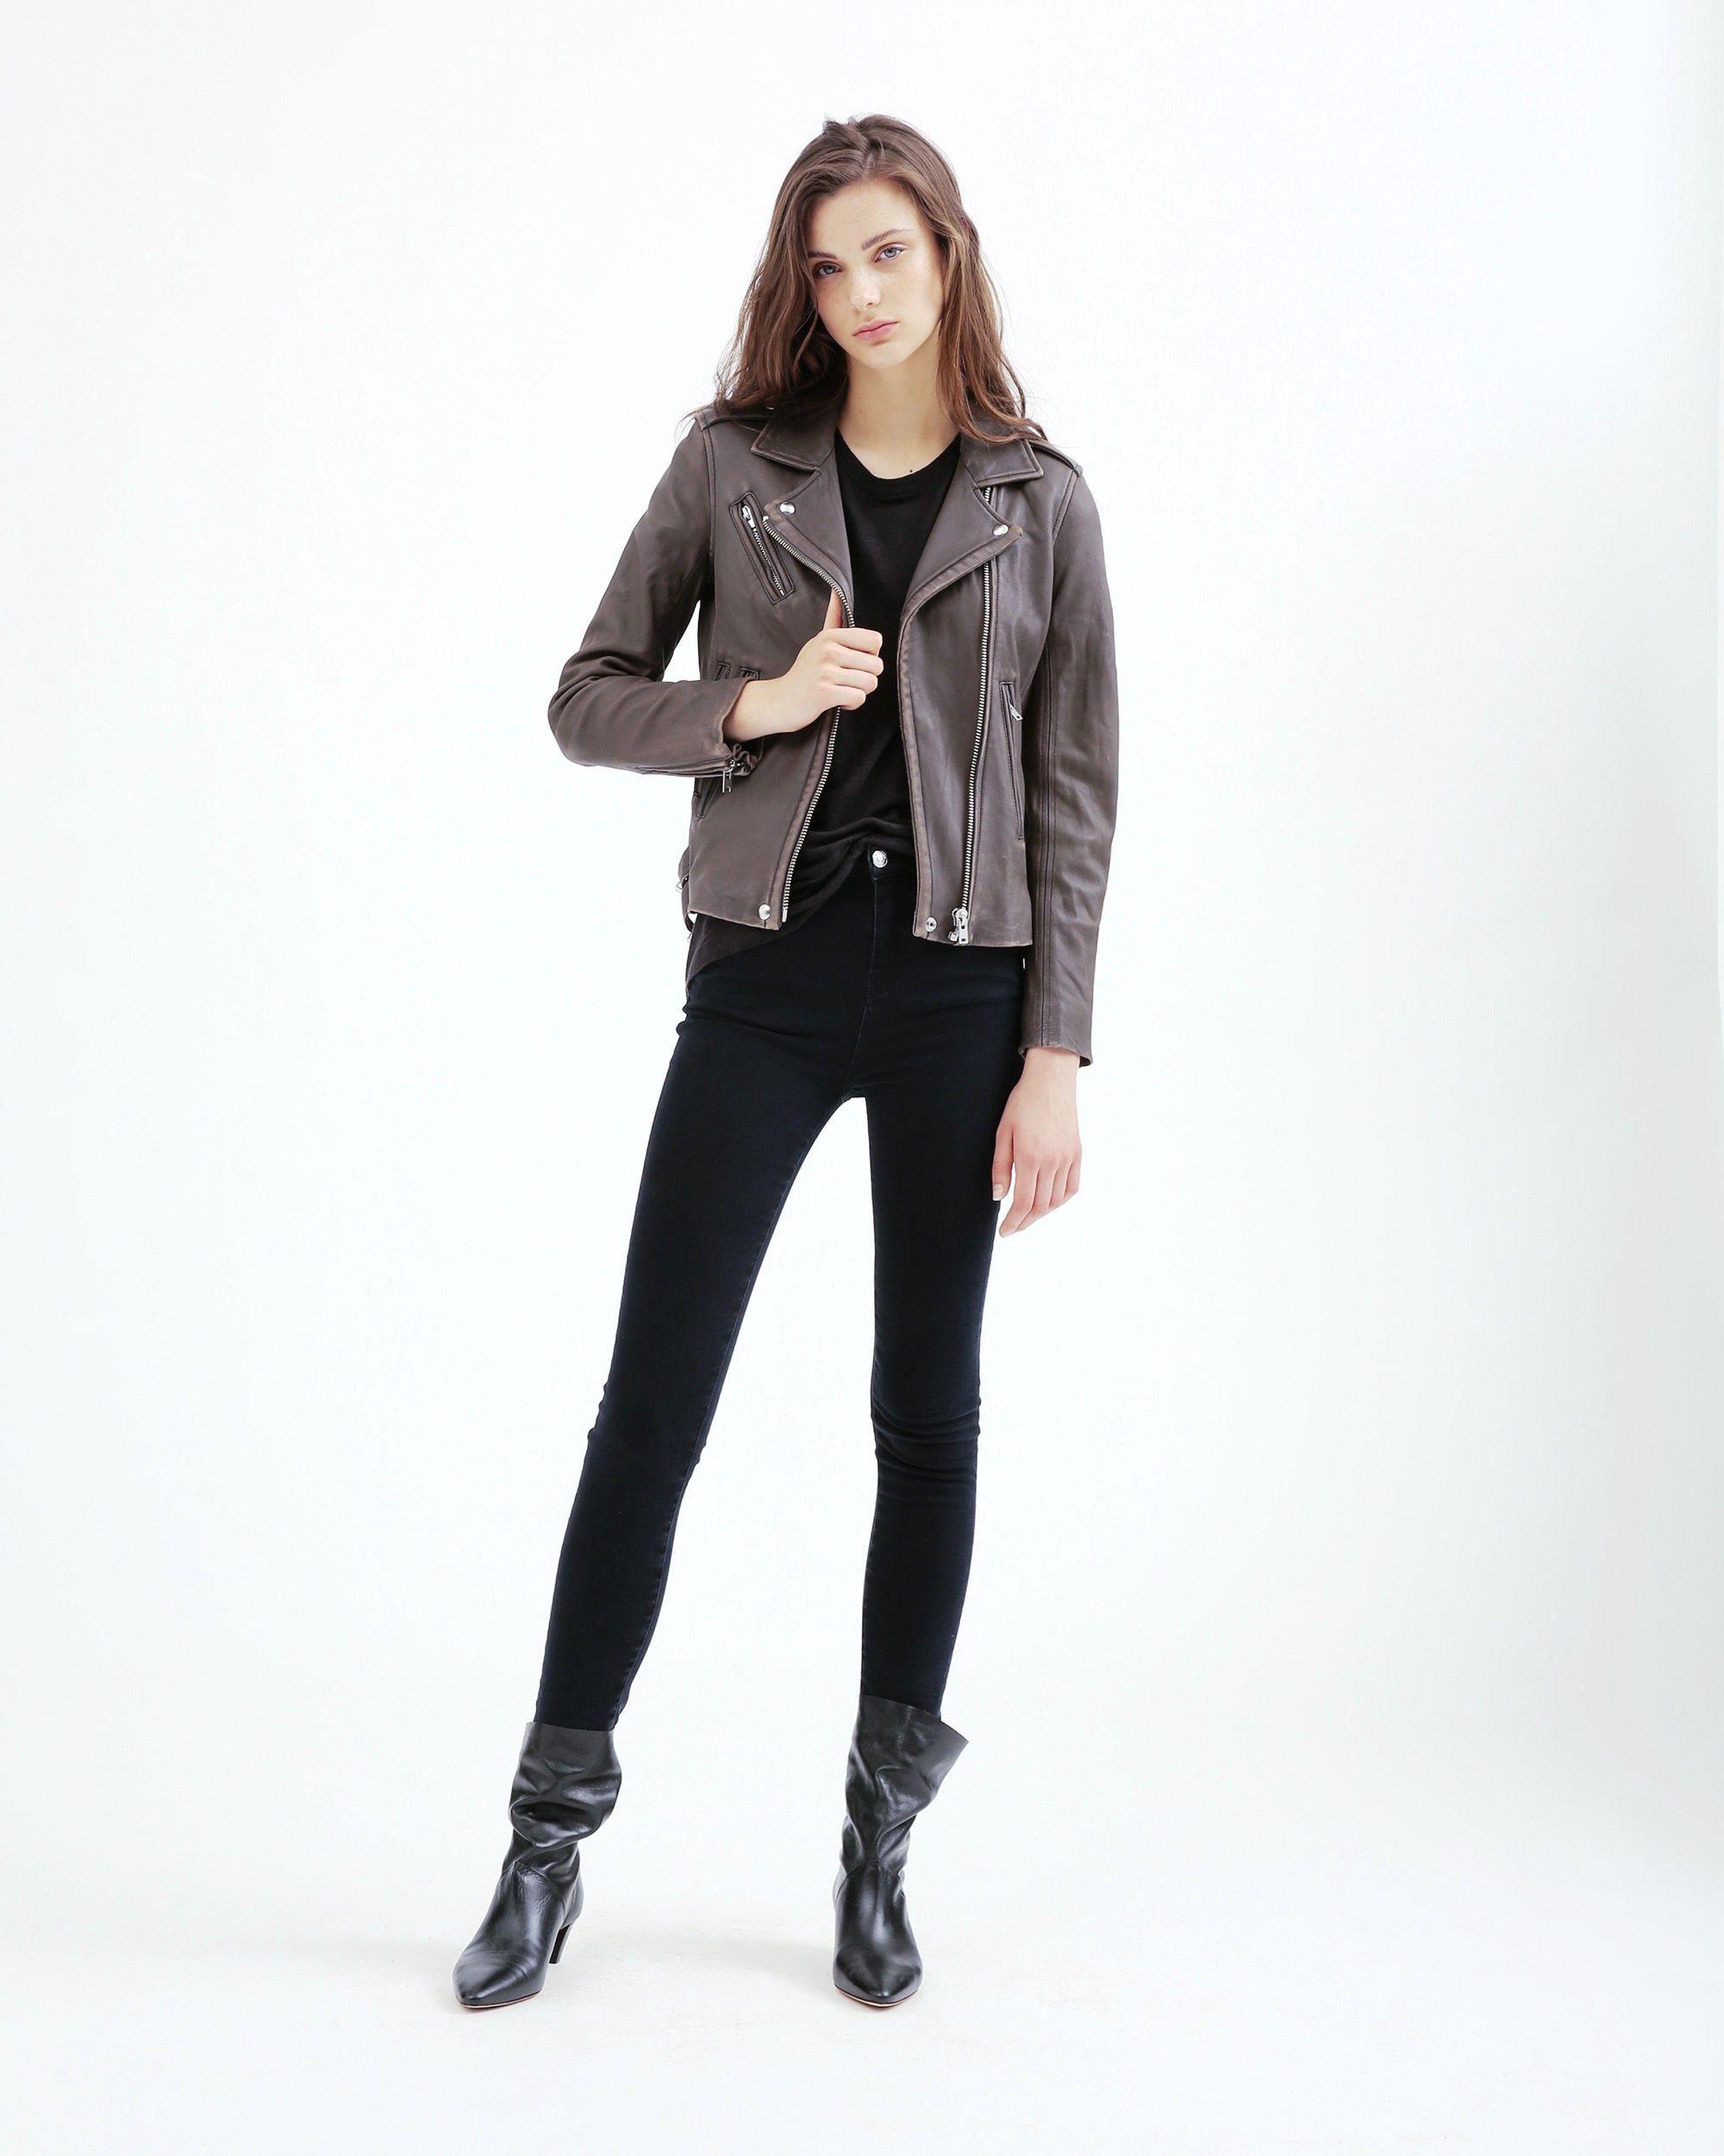 Iro Han Leather Jacket Smoke Grey Iro Cloth Leather Jacket Jackets Fashion [ 2501 x 2000 Pixel ]